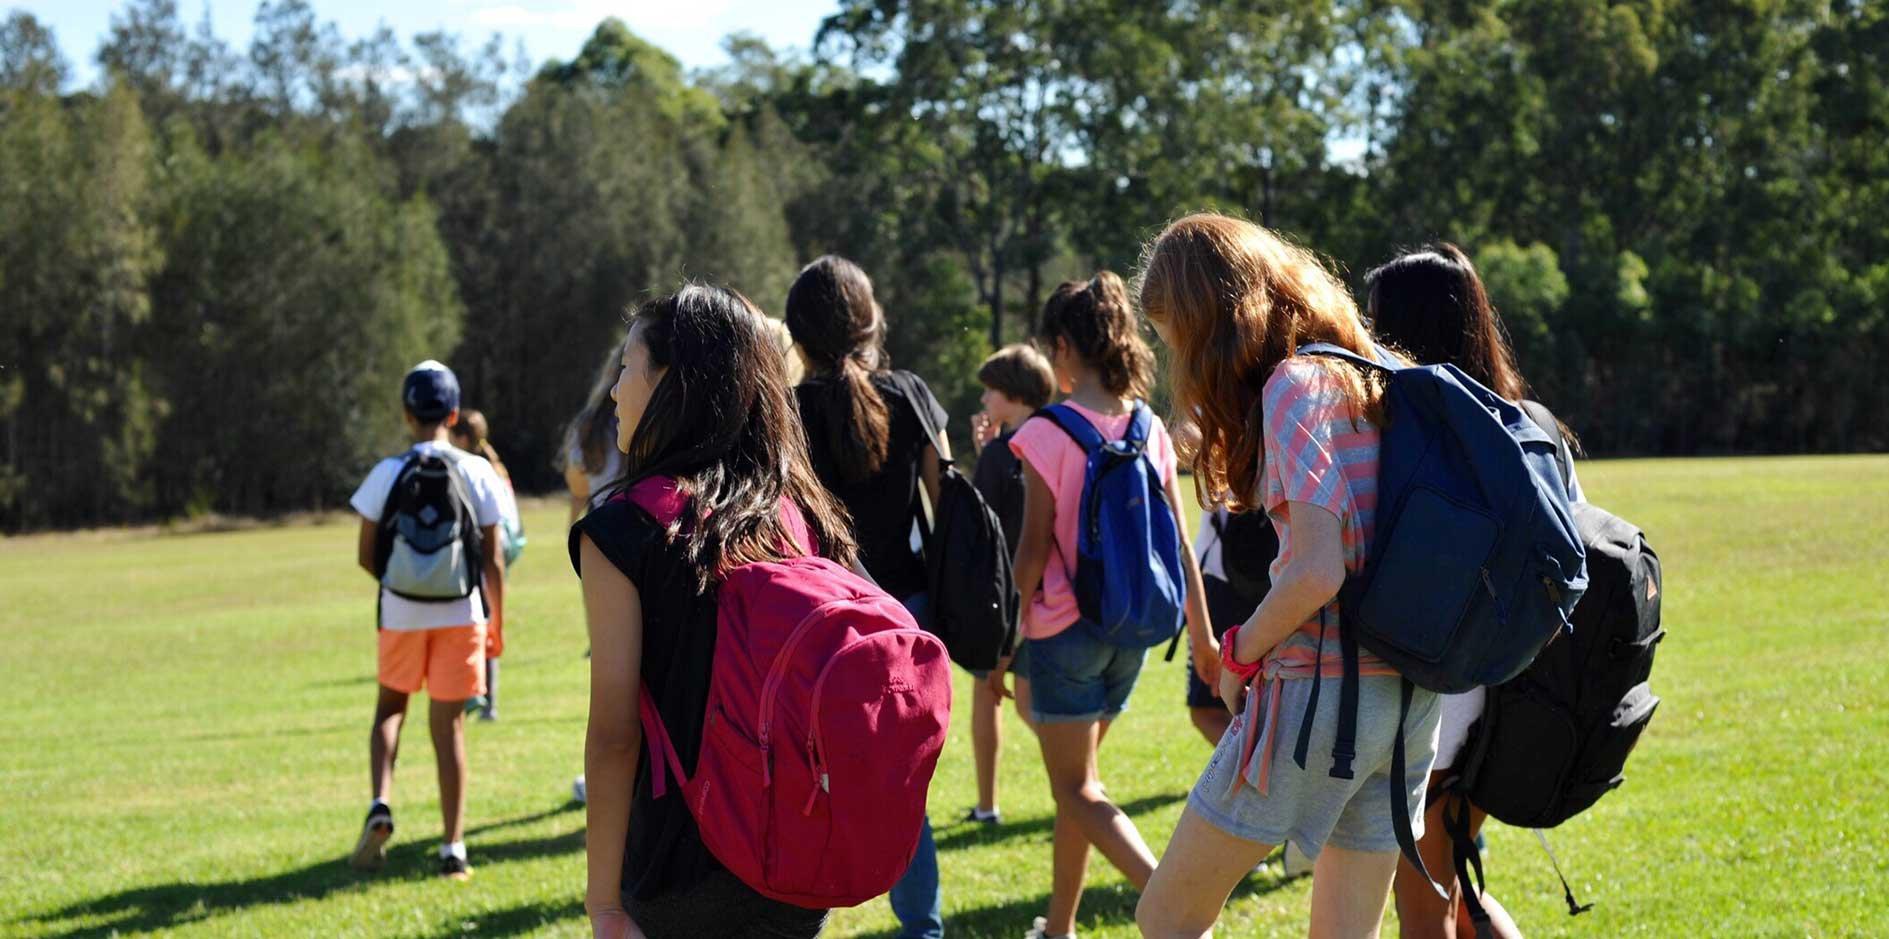 students in field